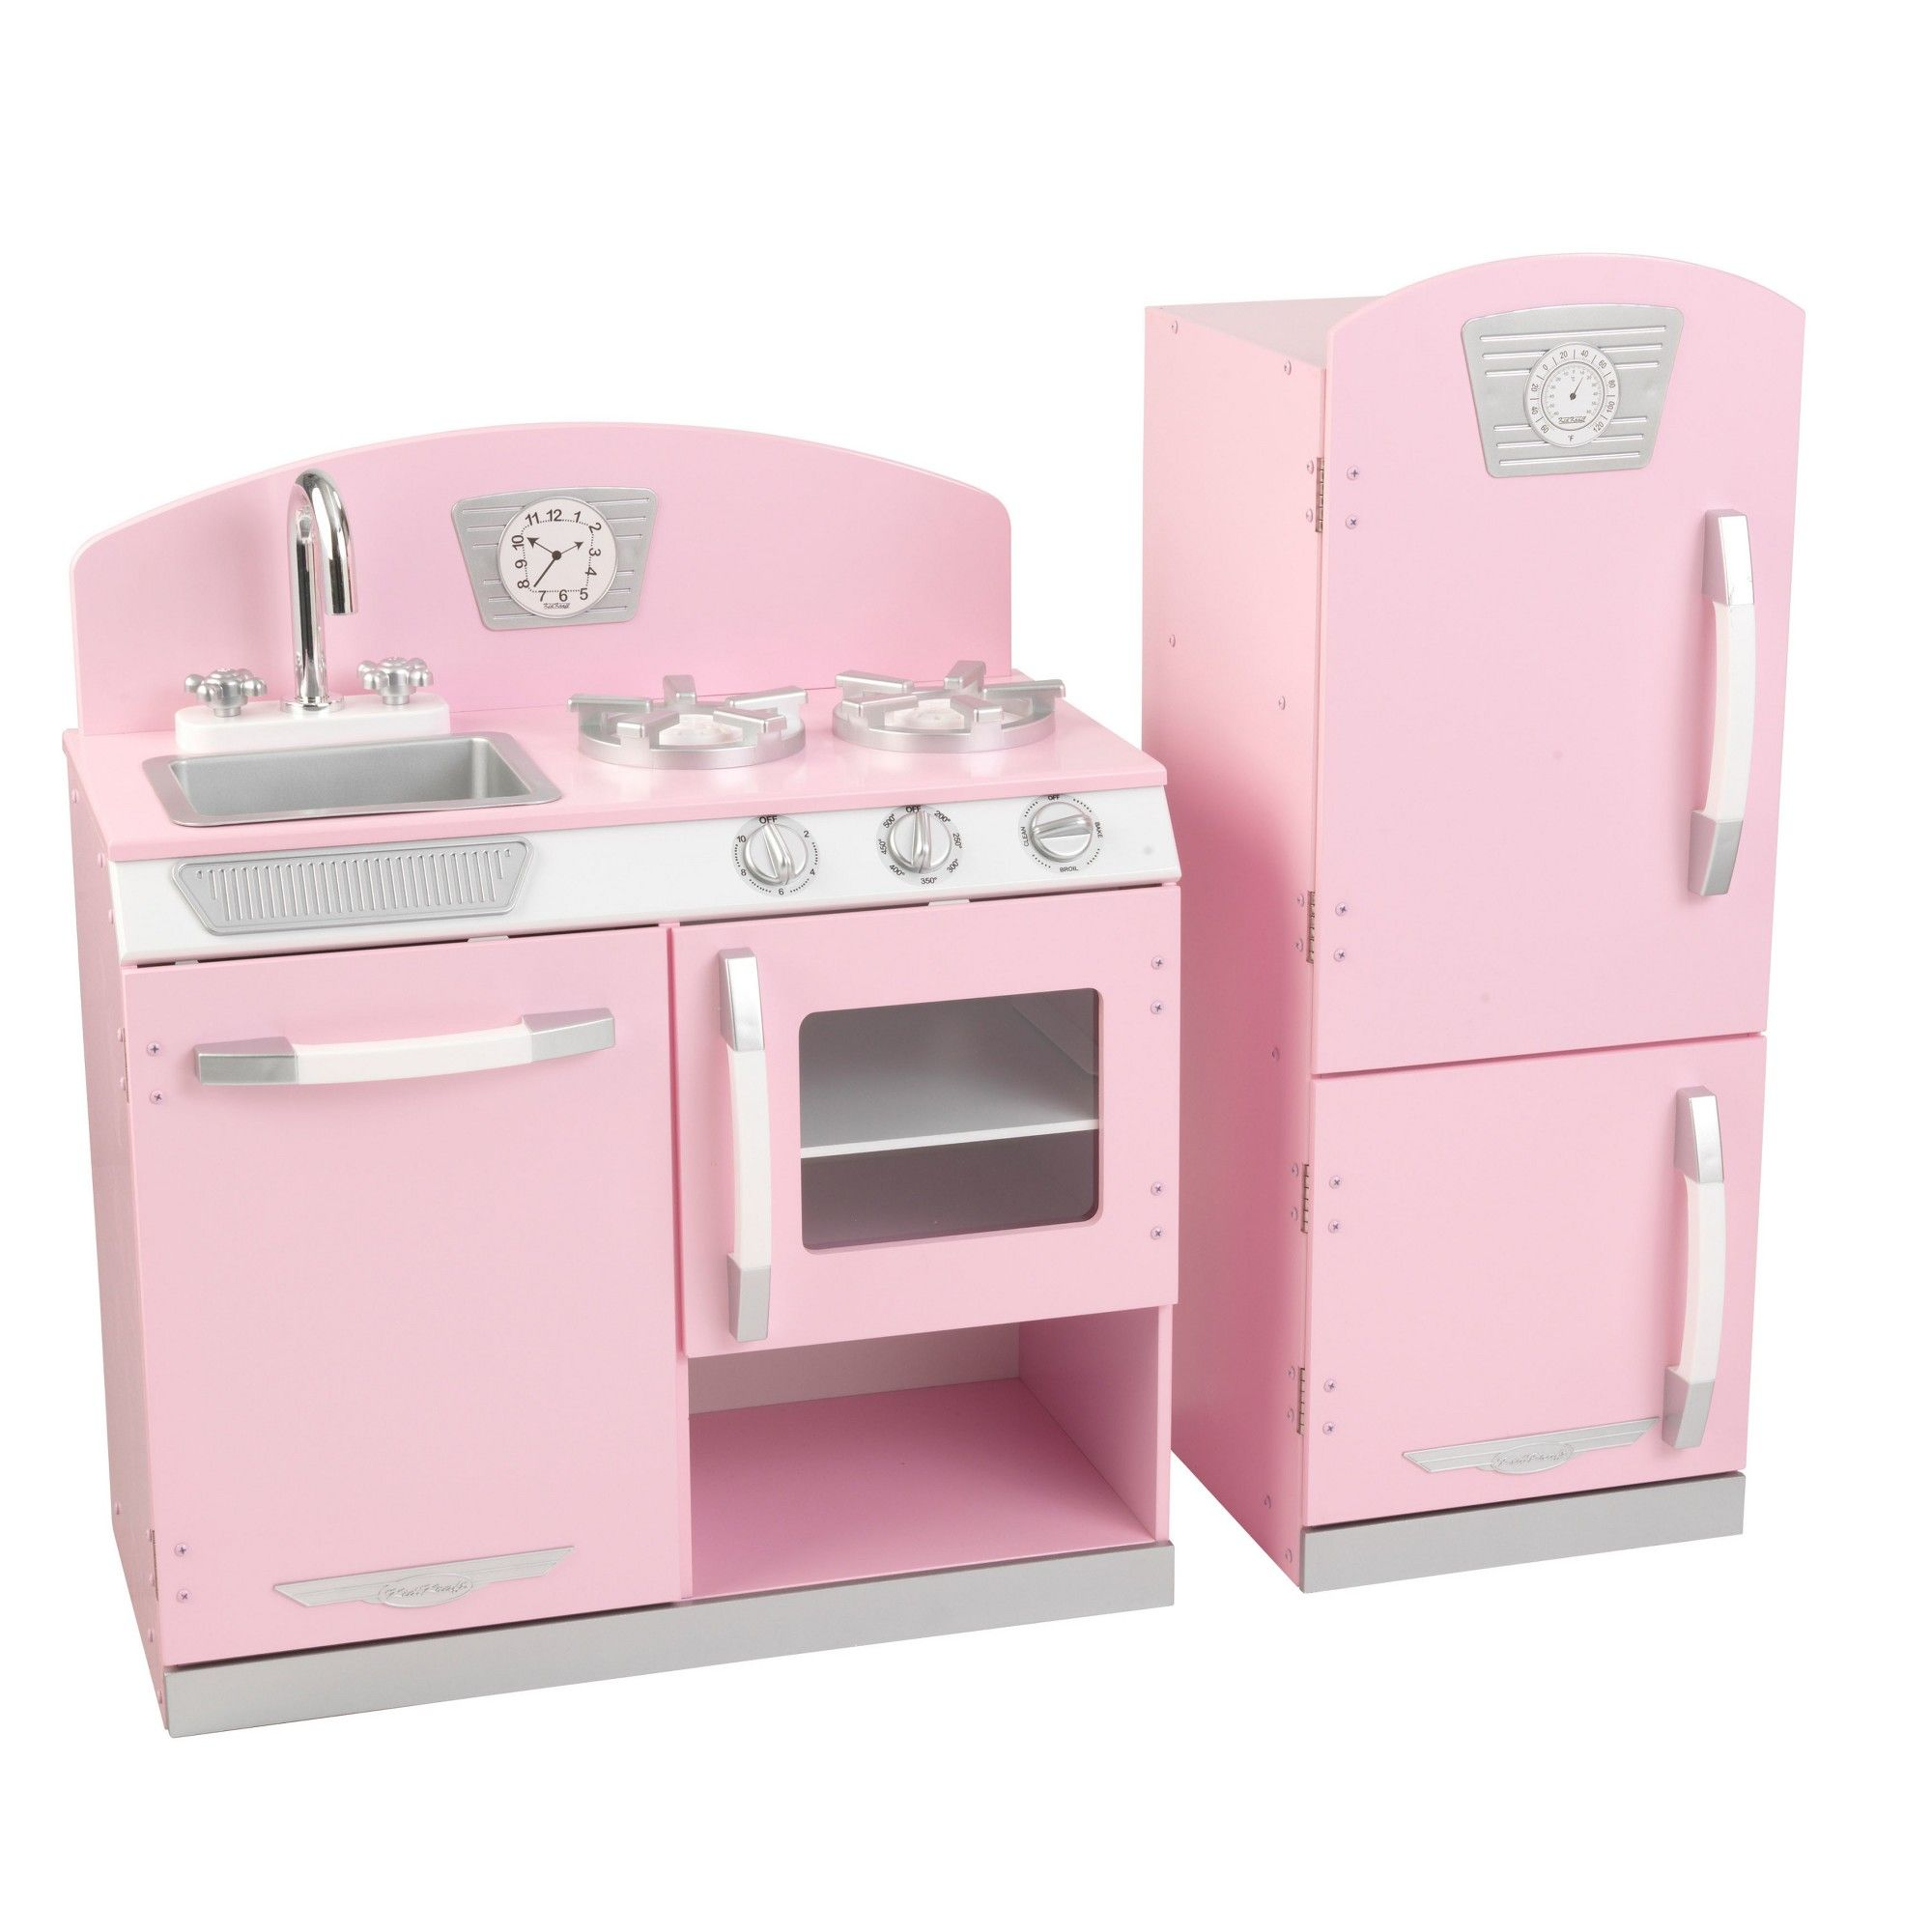 Kidkraft pink retro kitchen and refrigerator play set refrigerator